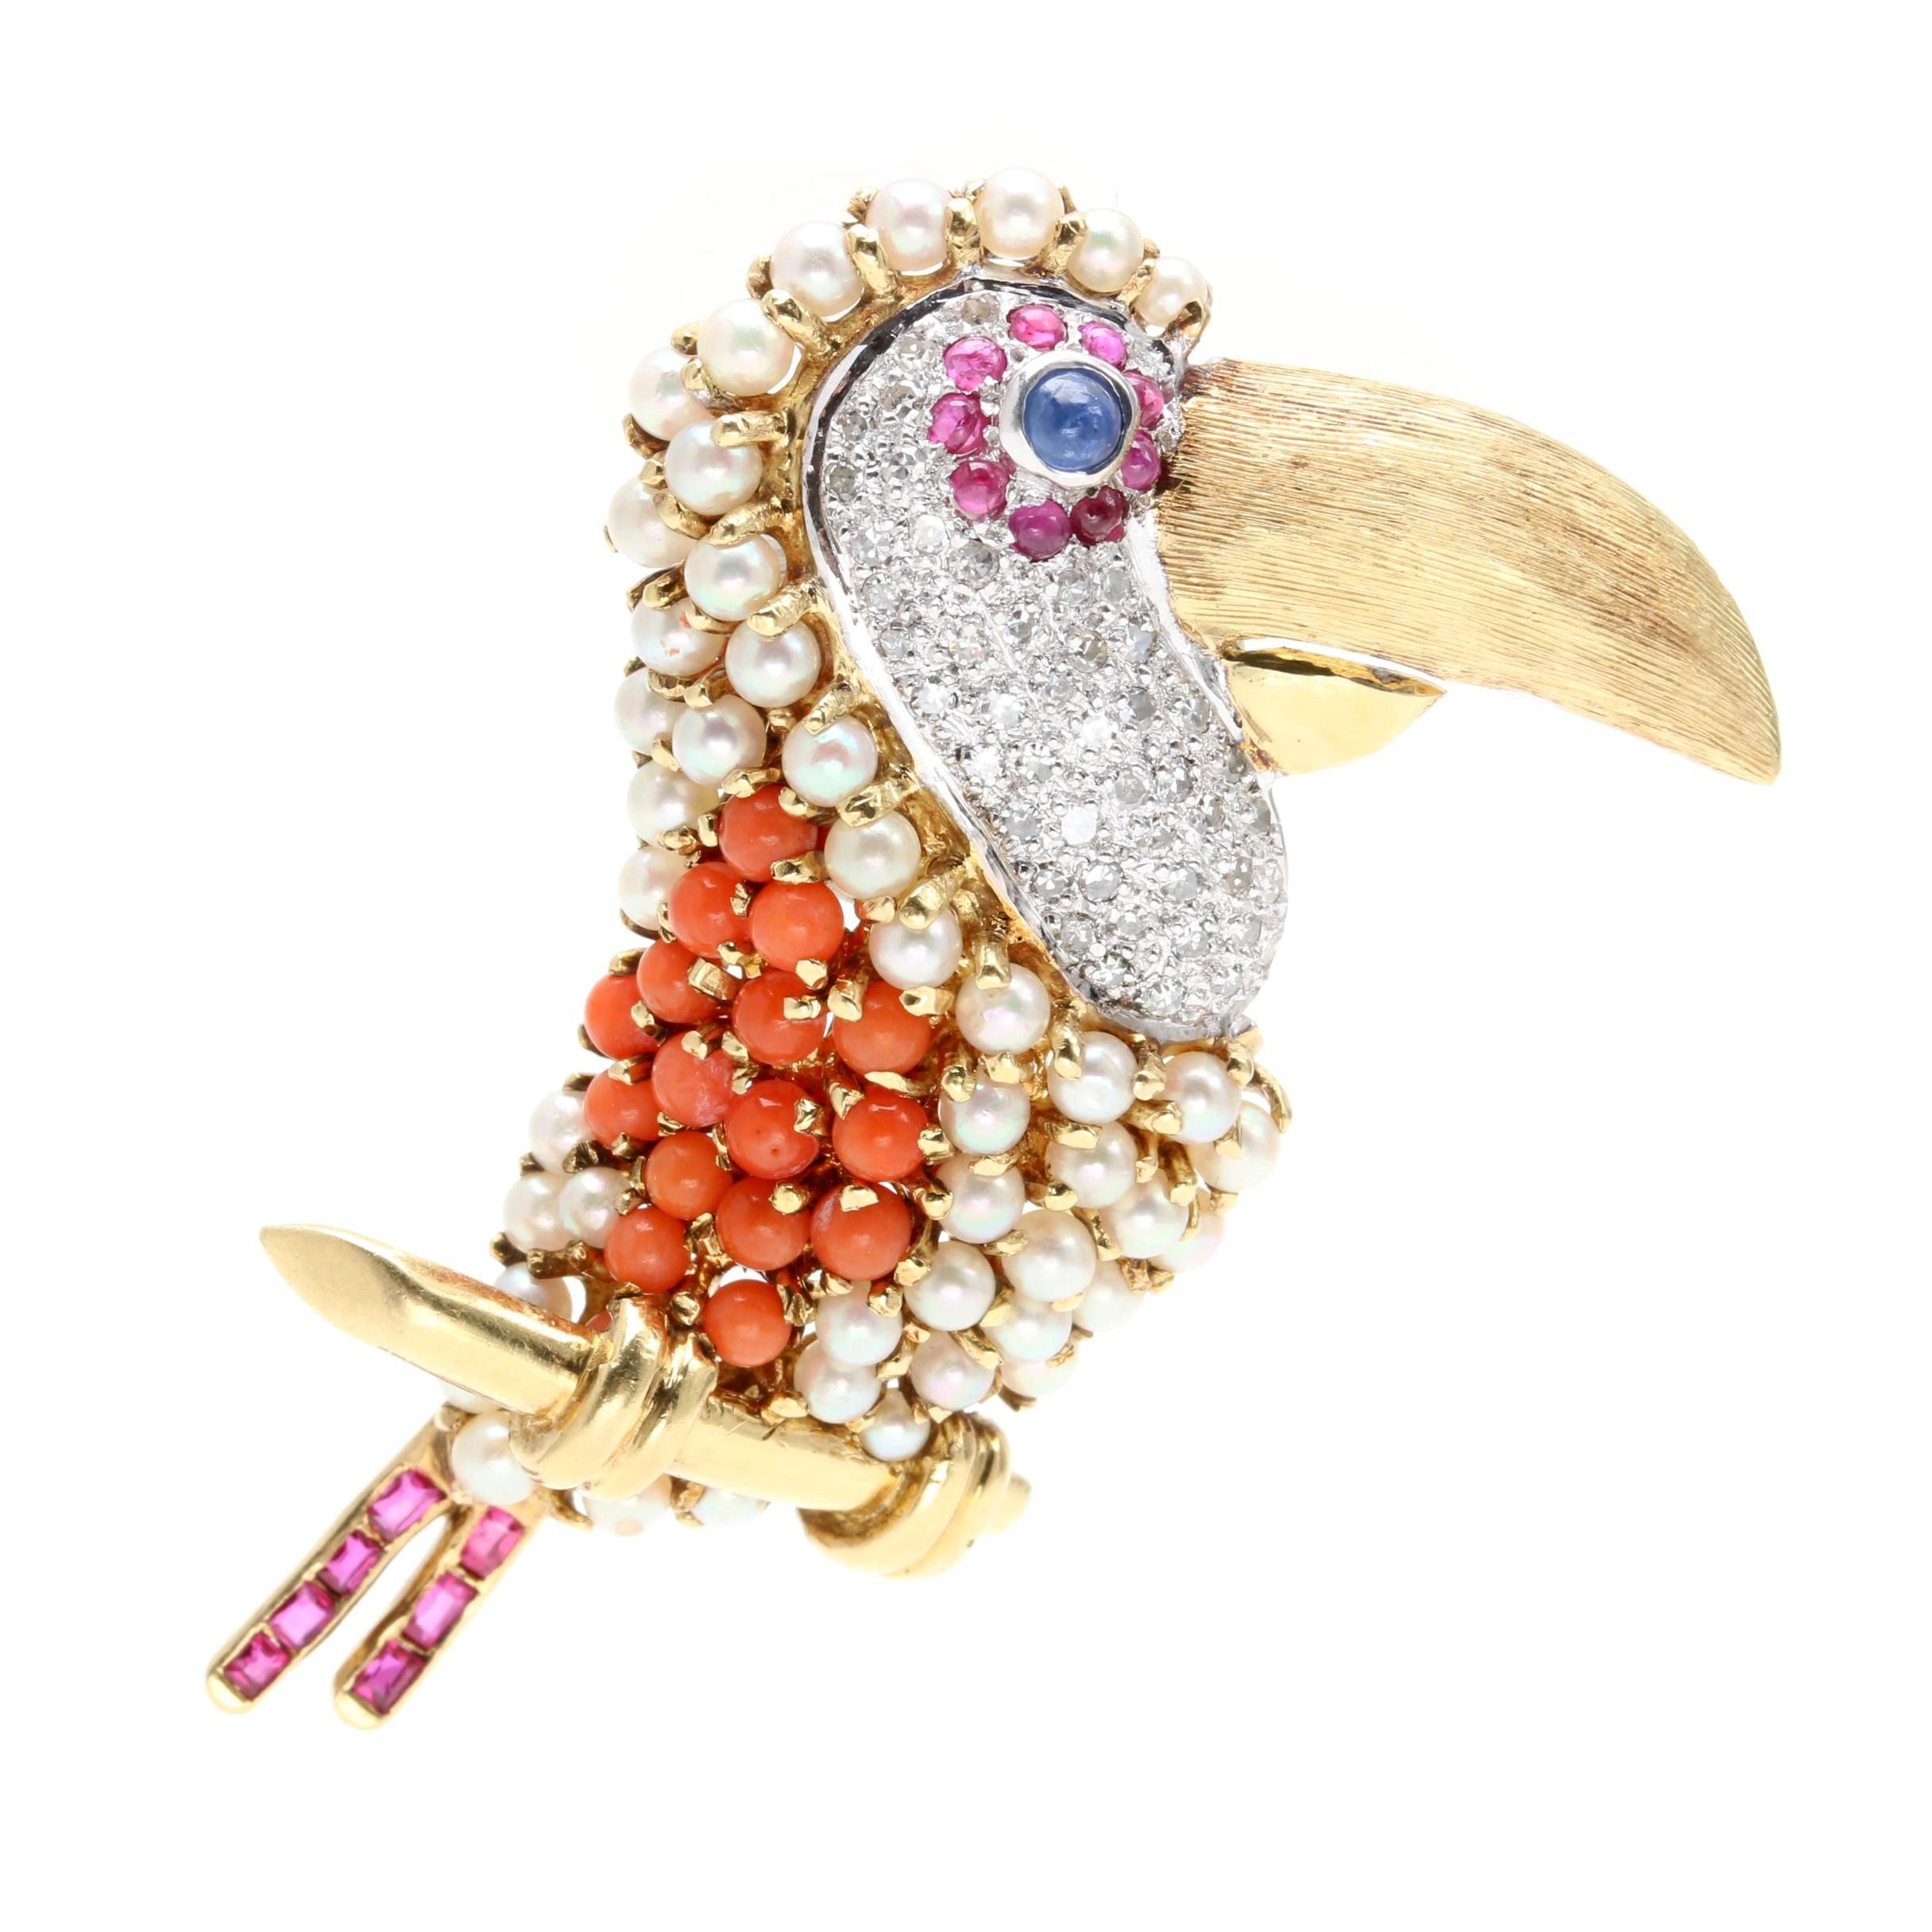 14K Yellow Gold Diamond and Gemstone Bird Pendant